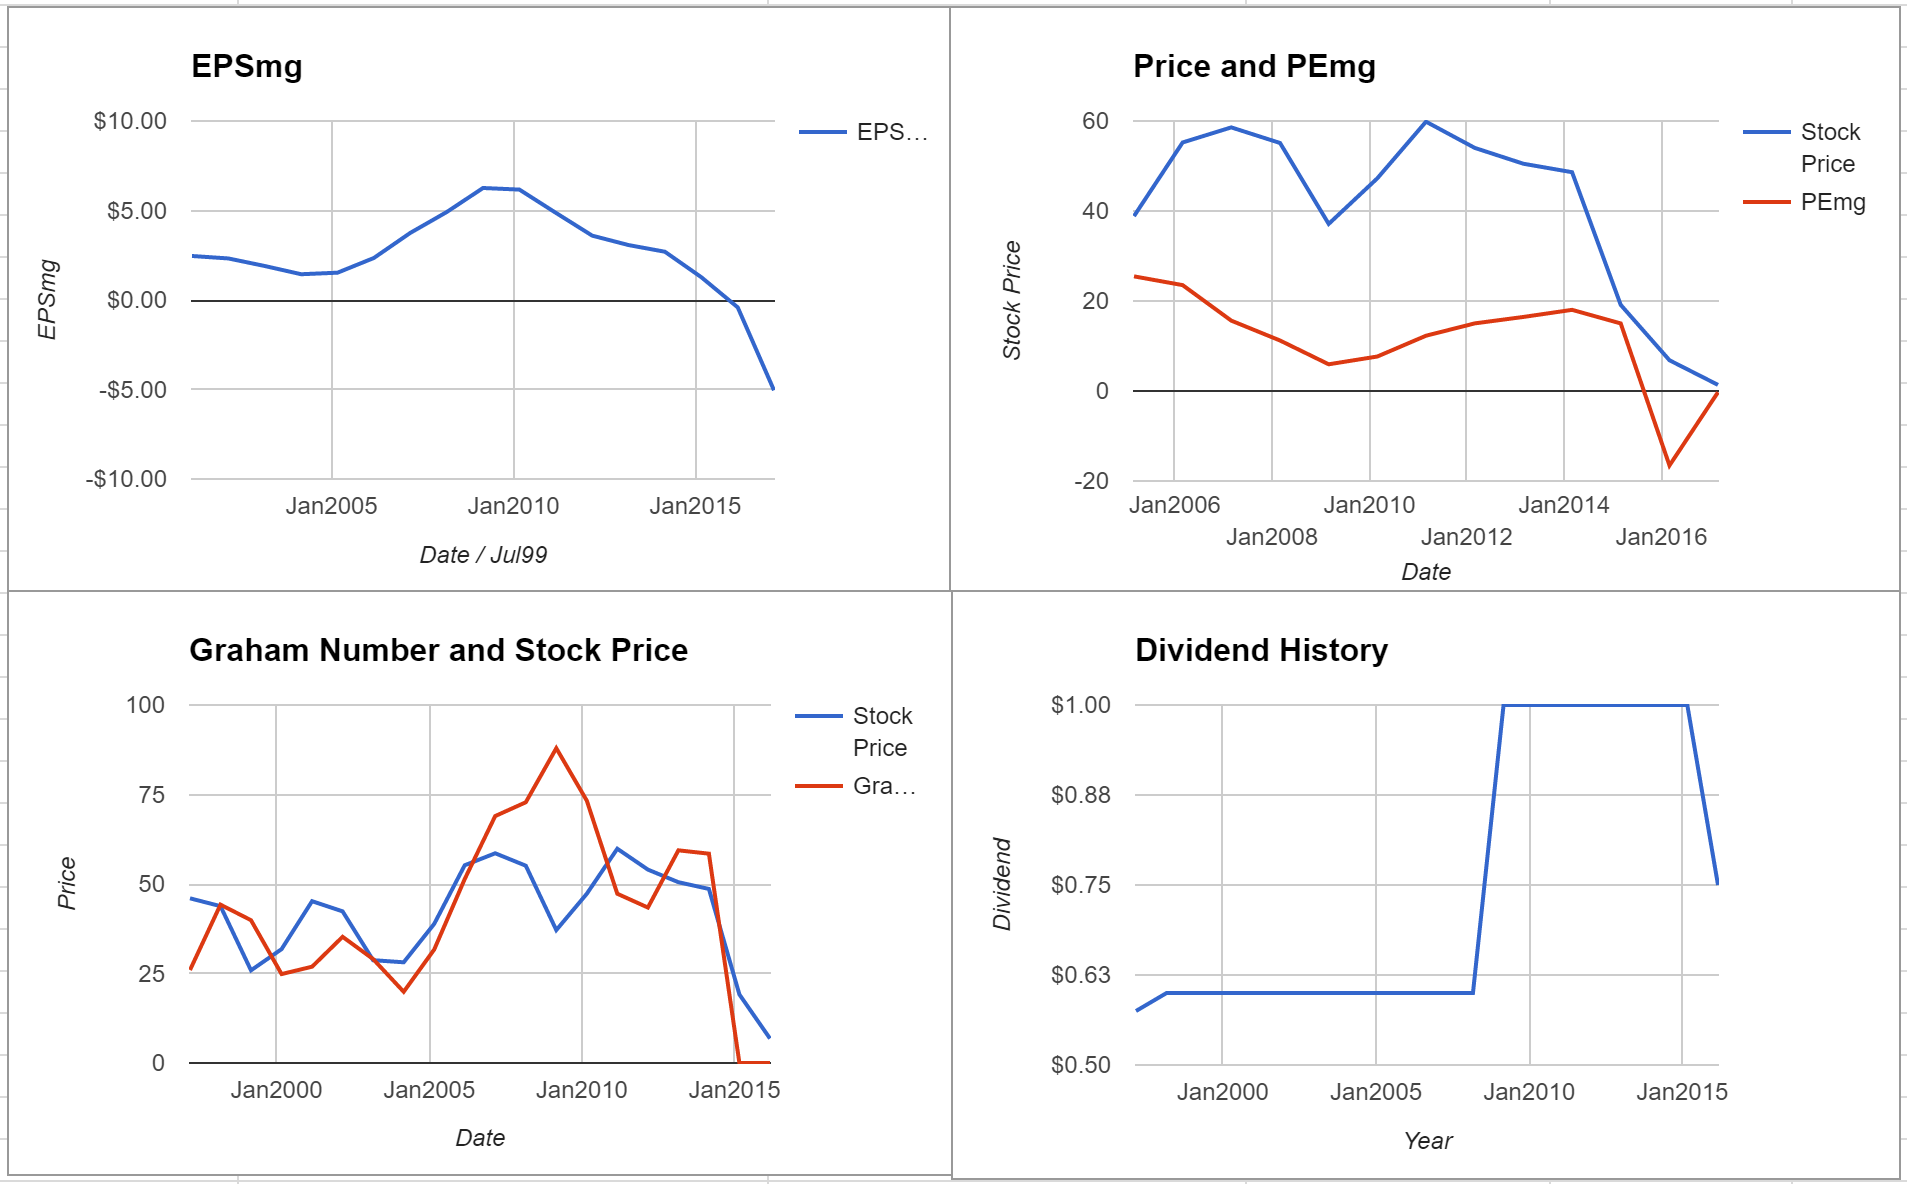 Tidewater Inc Valuation – February 2017 $TDW